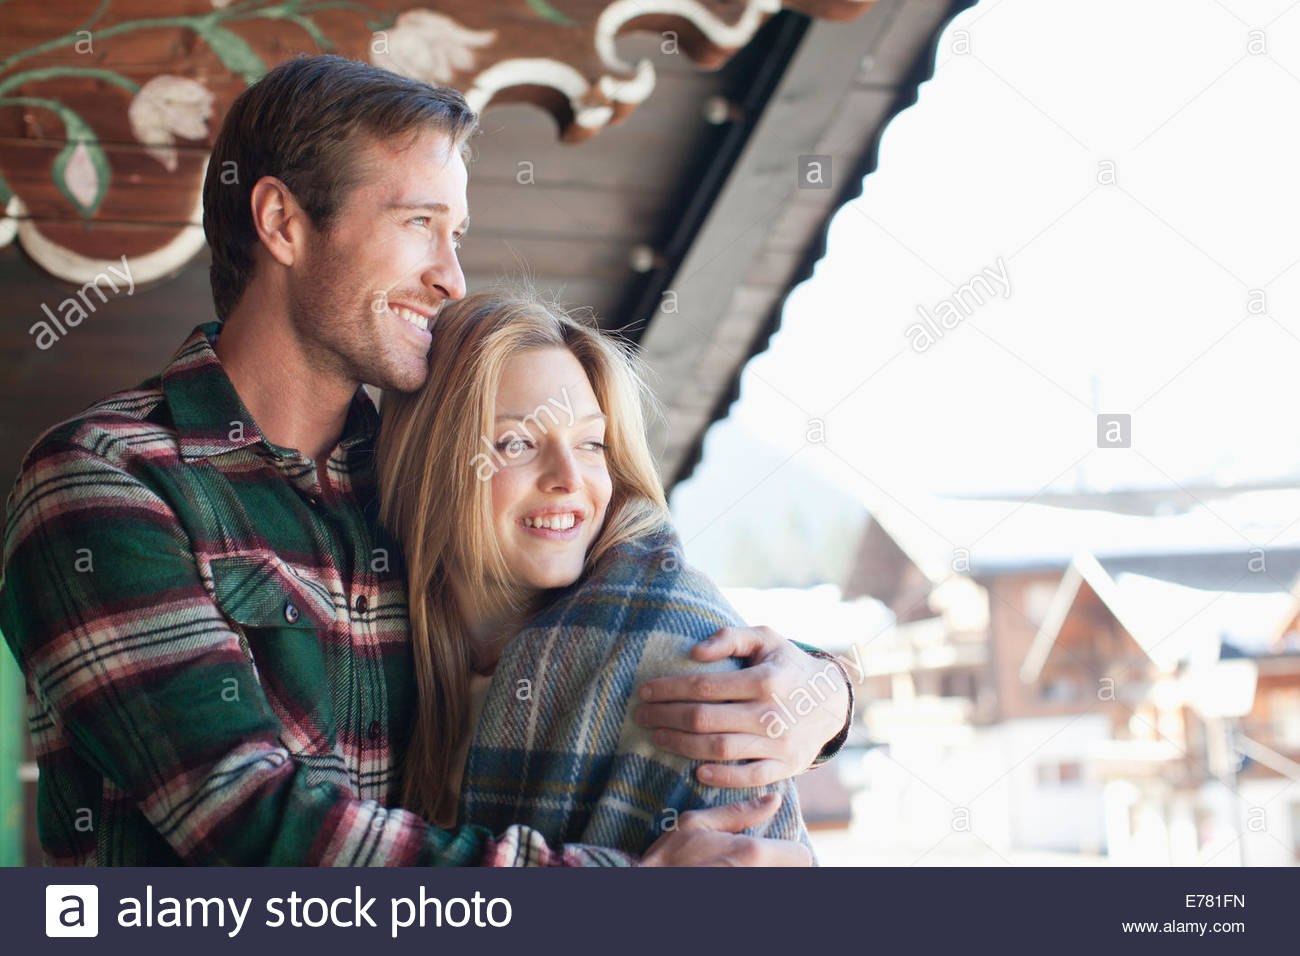 Lächelnde paar umarmt auf Kabine Veranda Stockbild